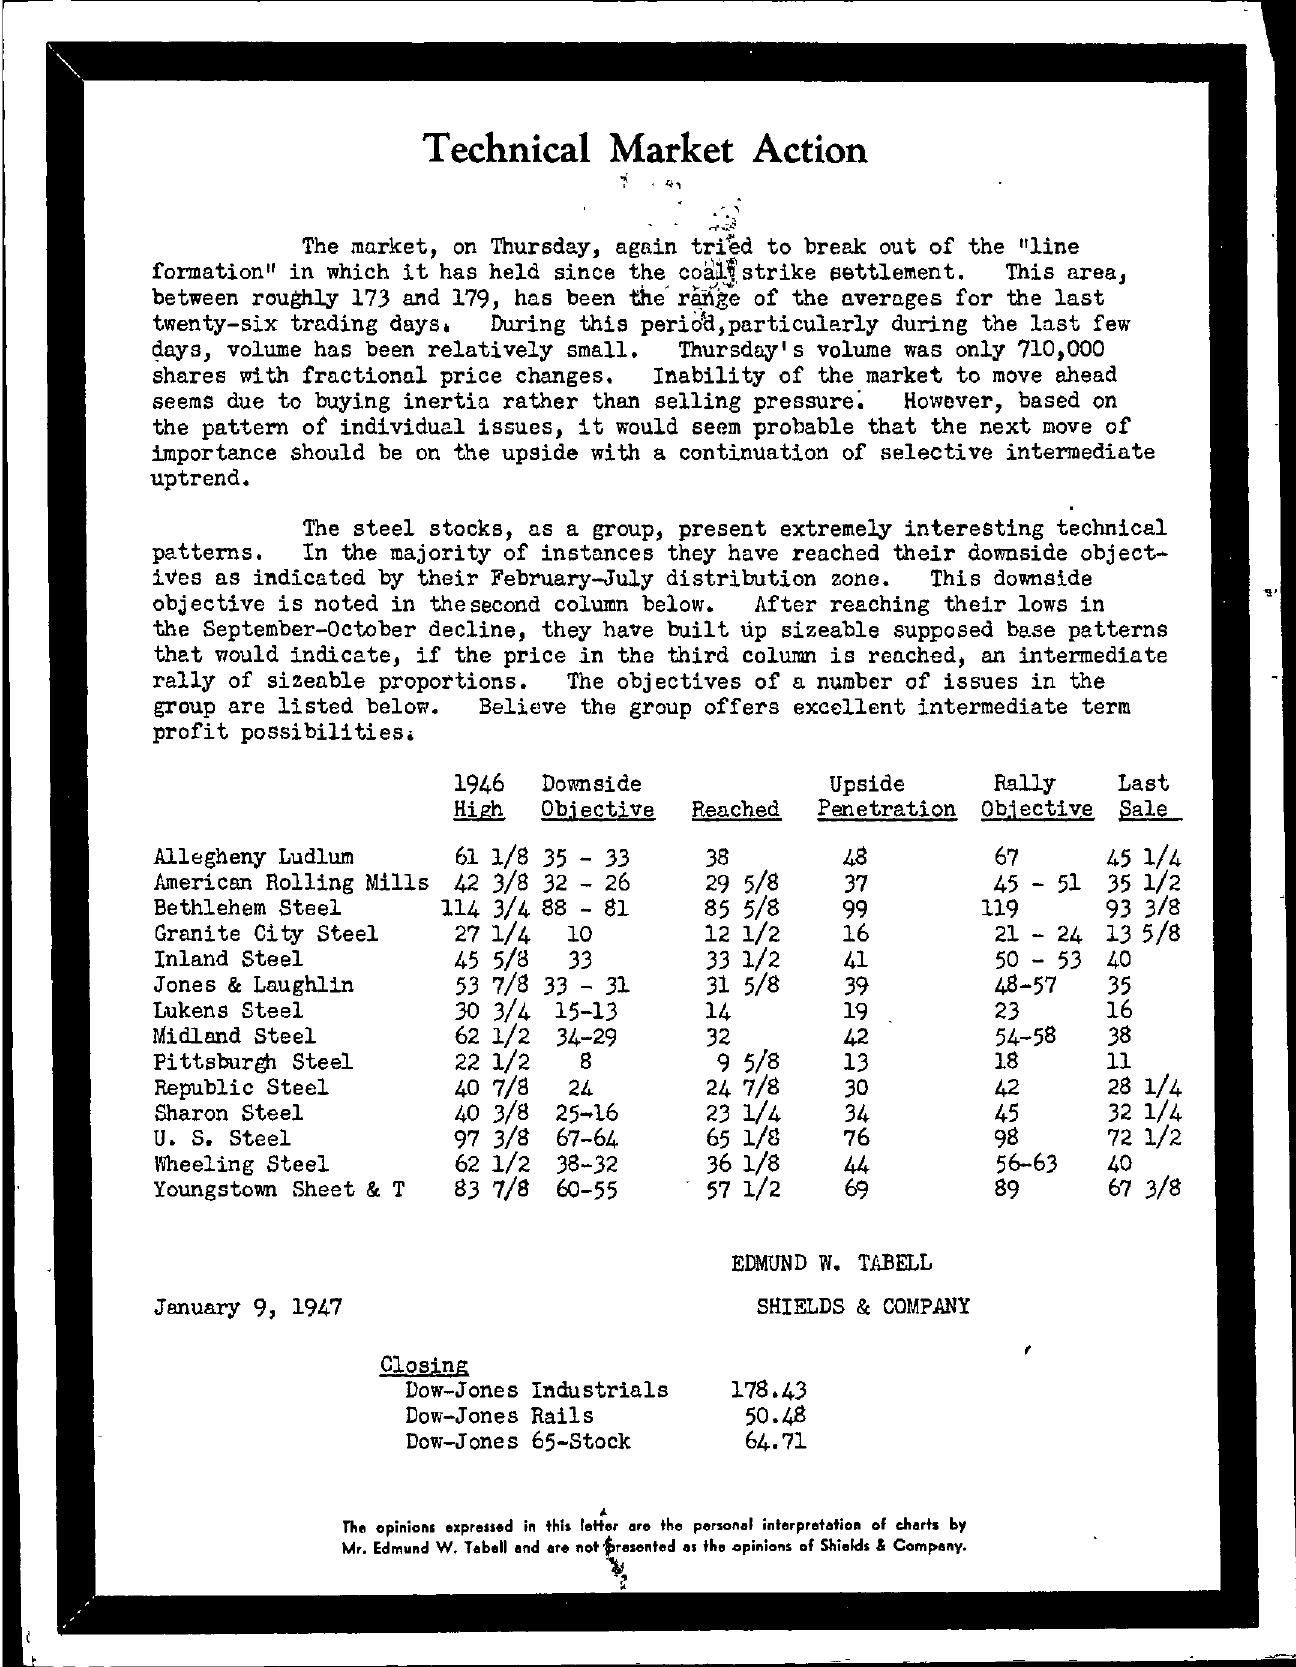 Tabell's Market Letter - January 09, 1947